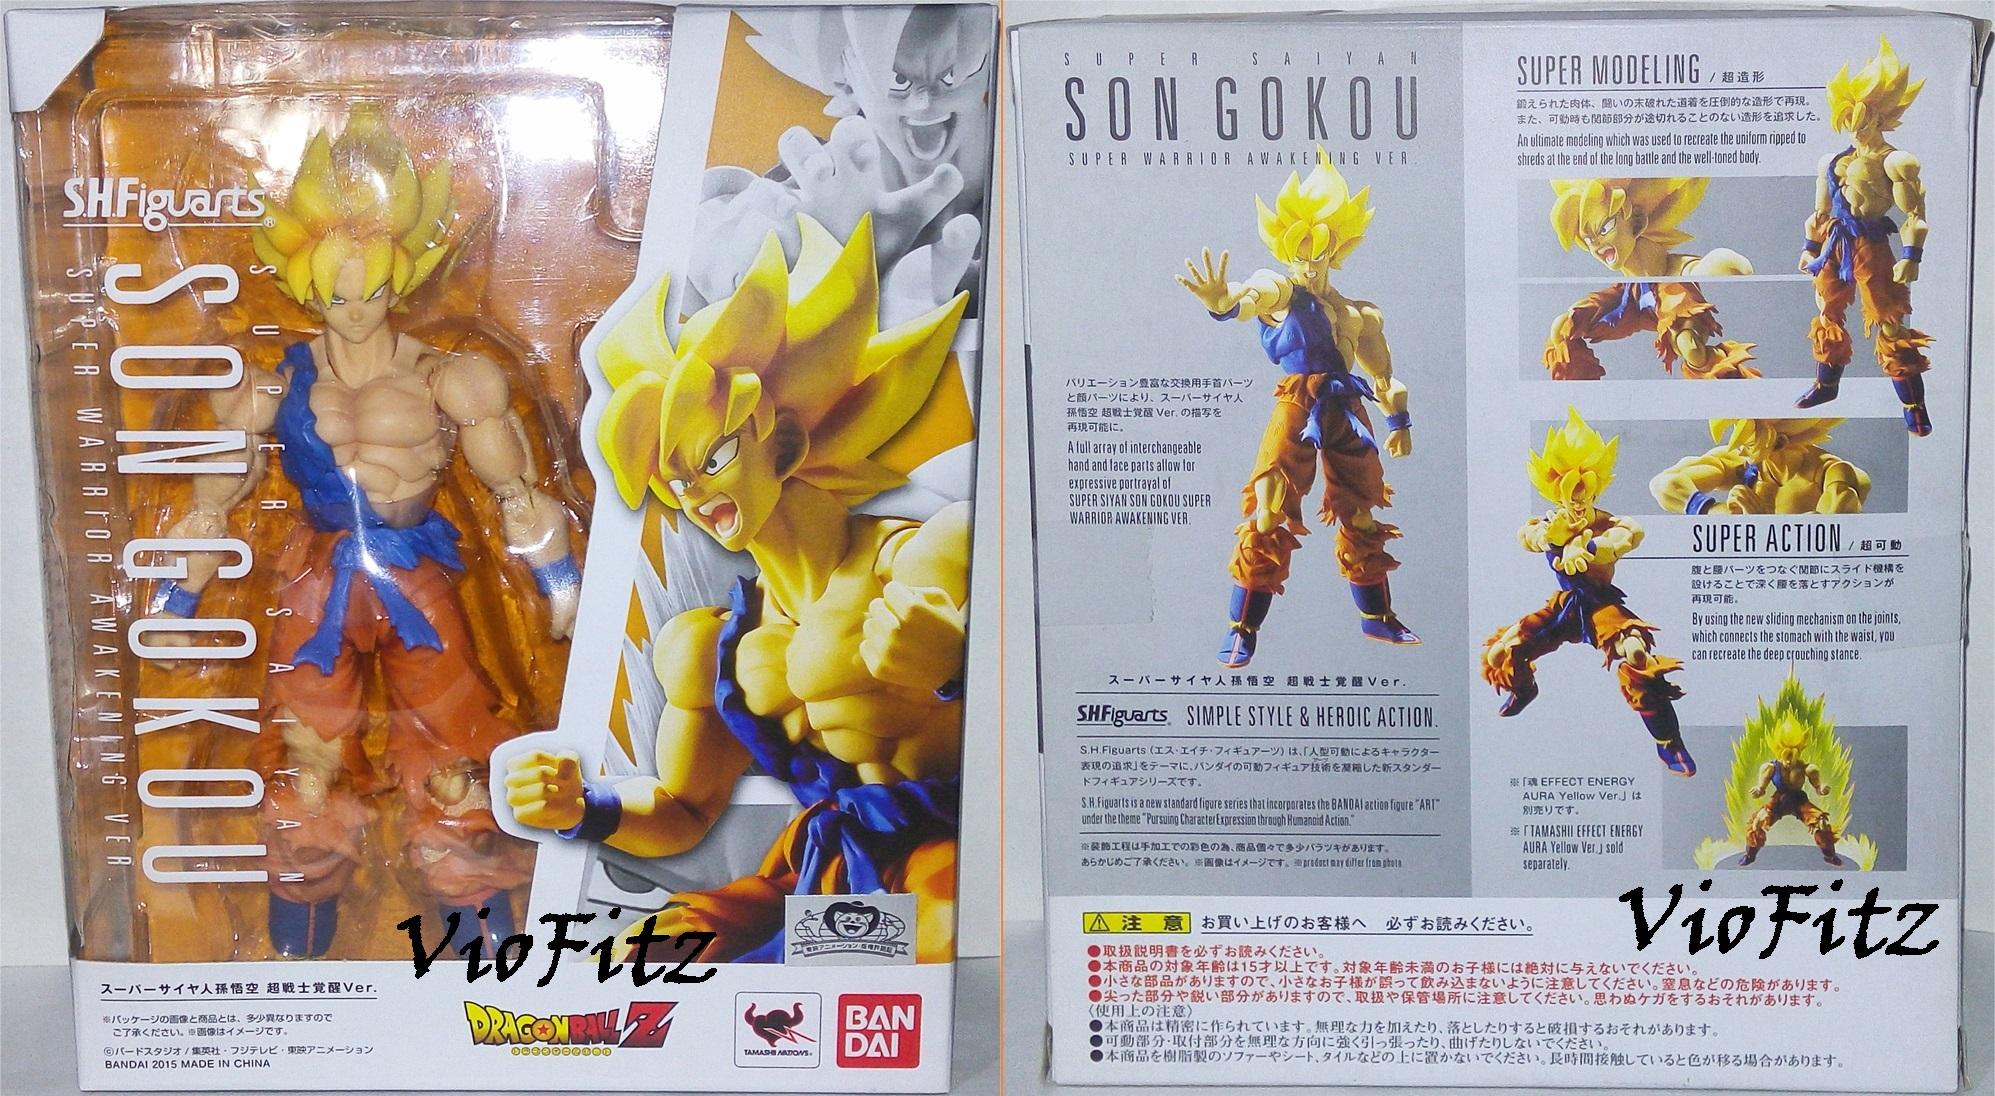 Super Saiyan Goku Super Warrior Awakening S.H Figuarts Bandai DRAGON BALL